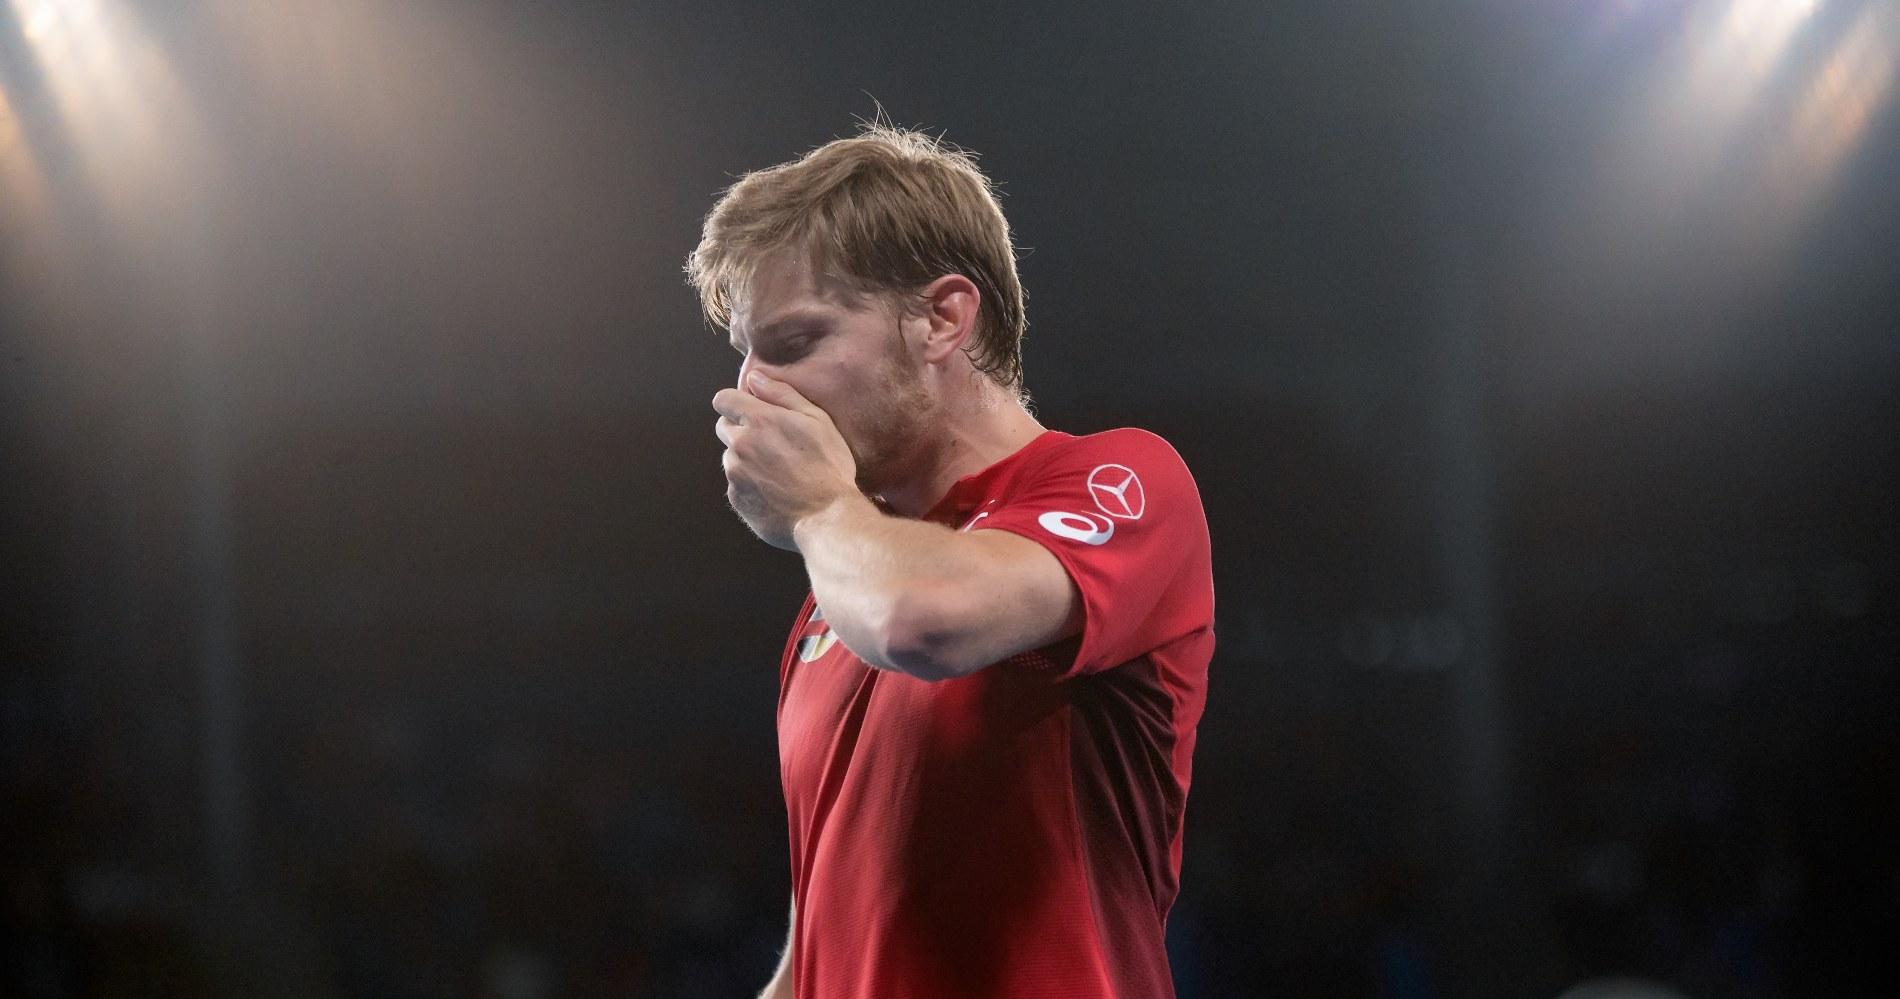 David Coffin, ATP Cup 2020